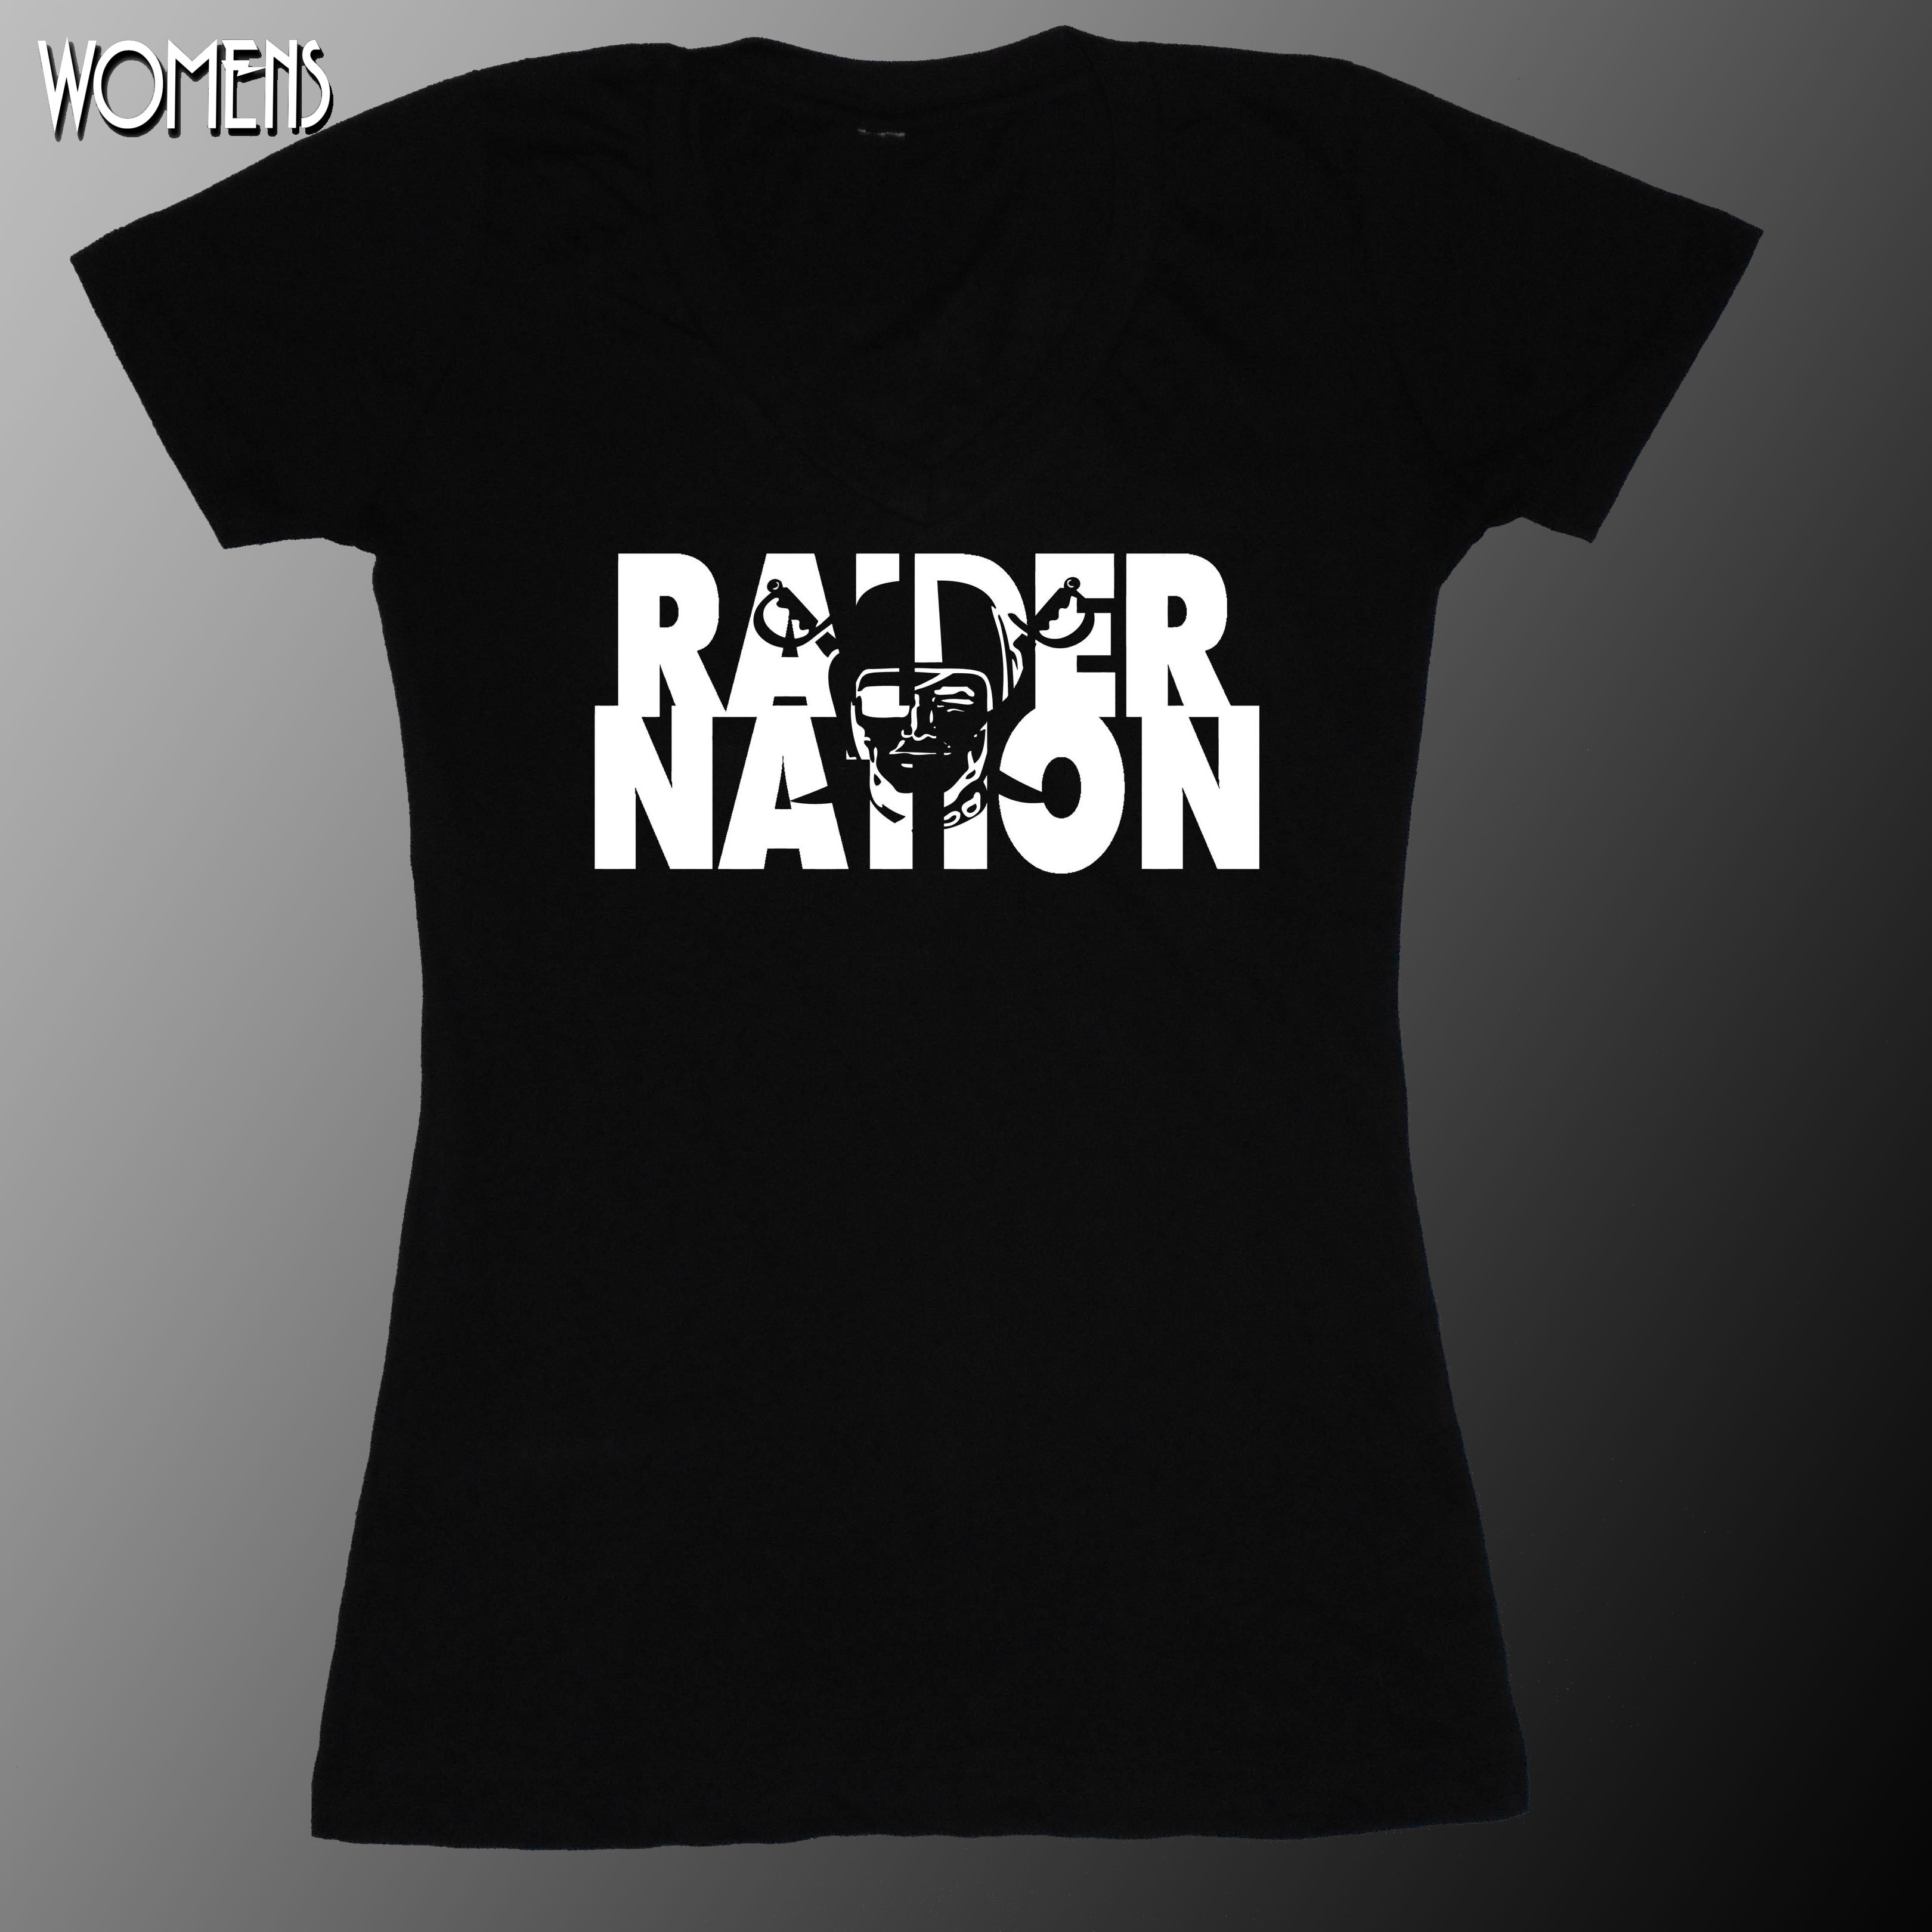 black hole raiders shirts - photo #27